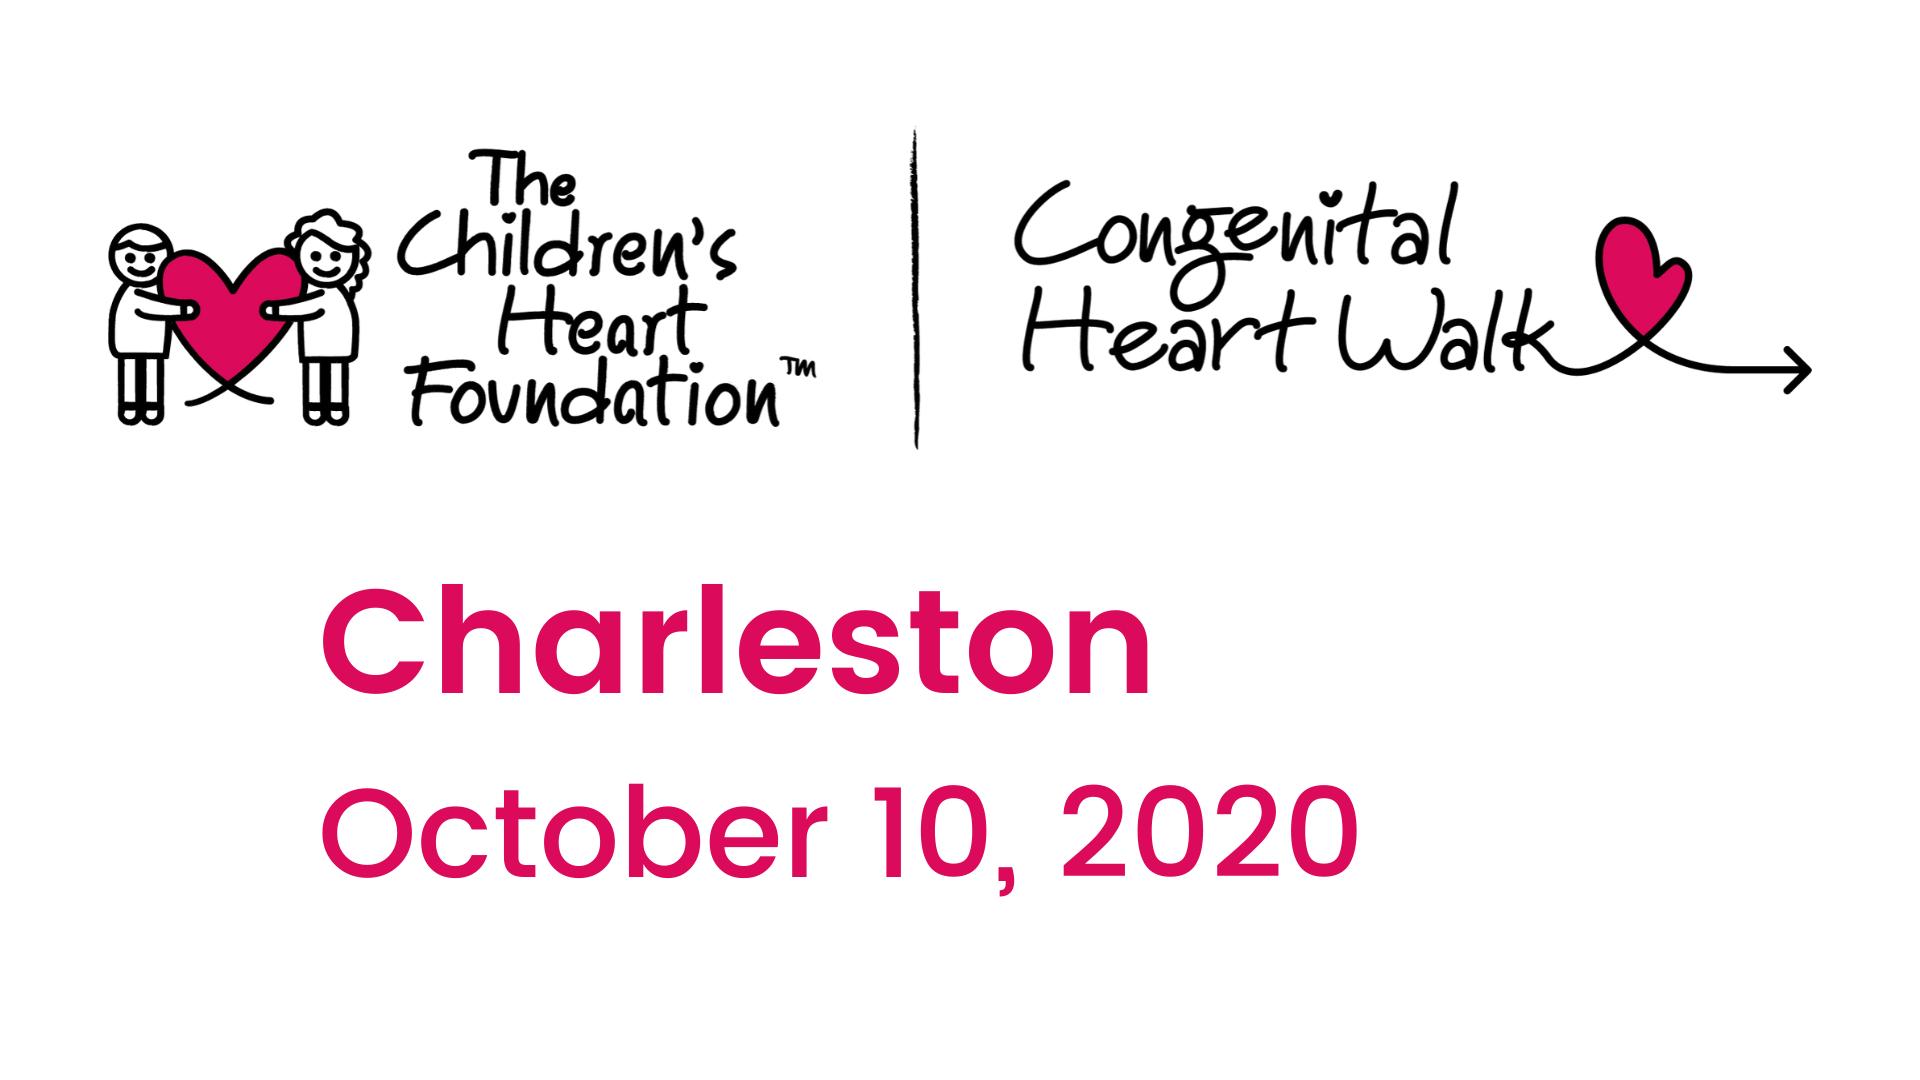 Charleston Congenital Heart Walk